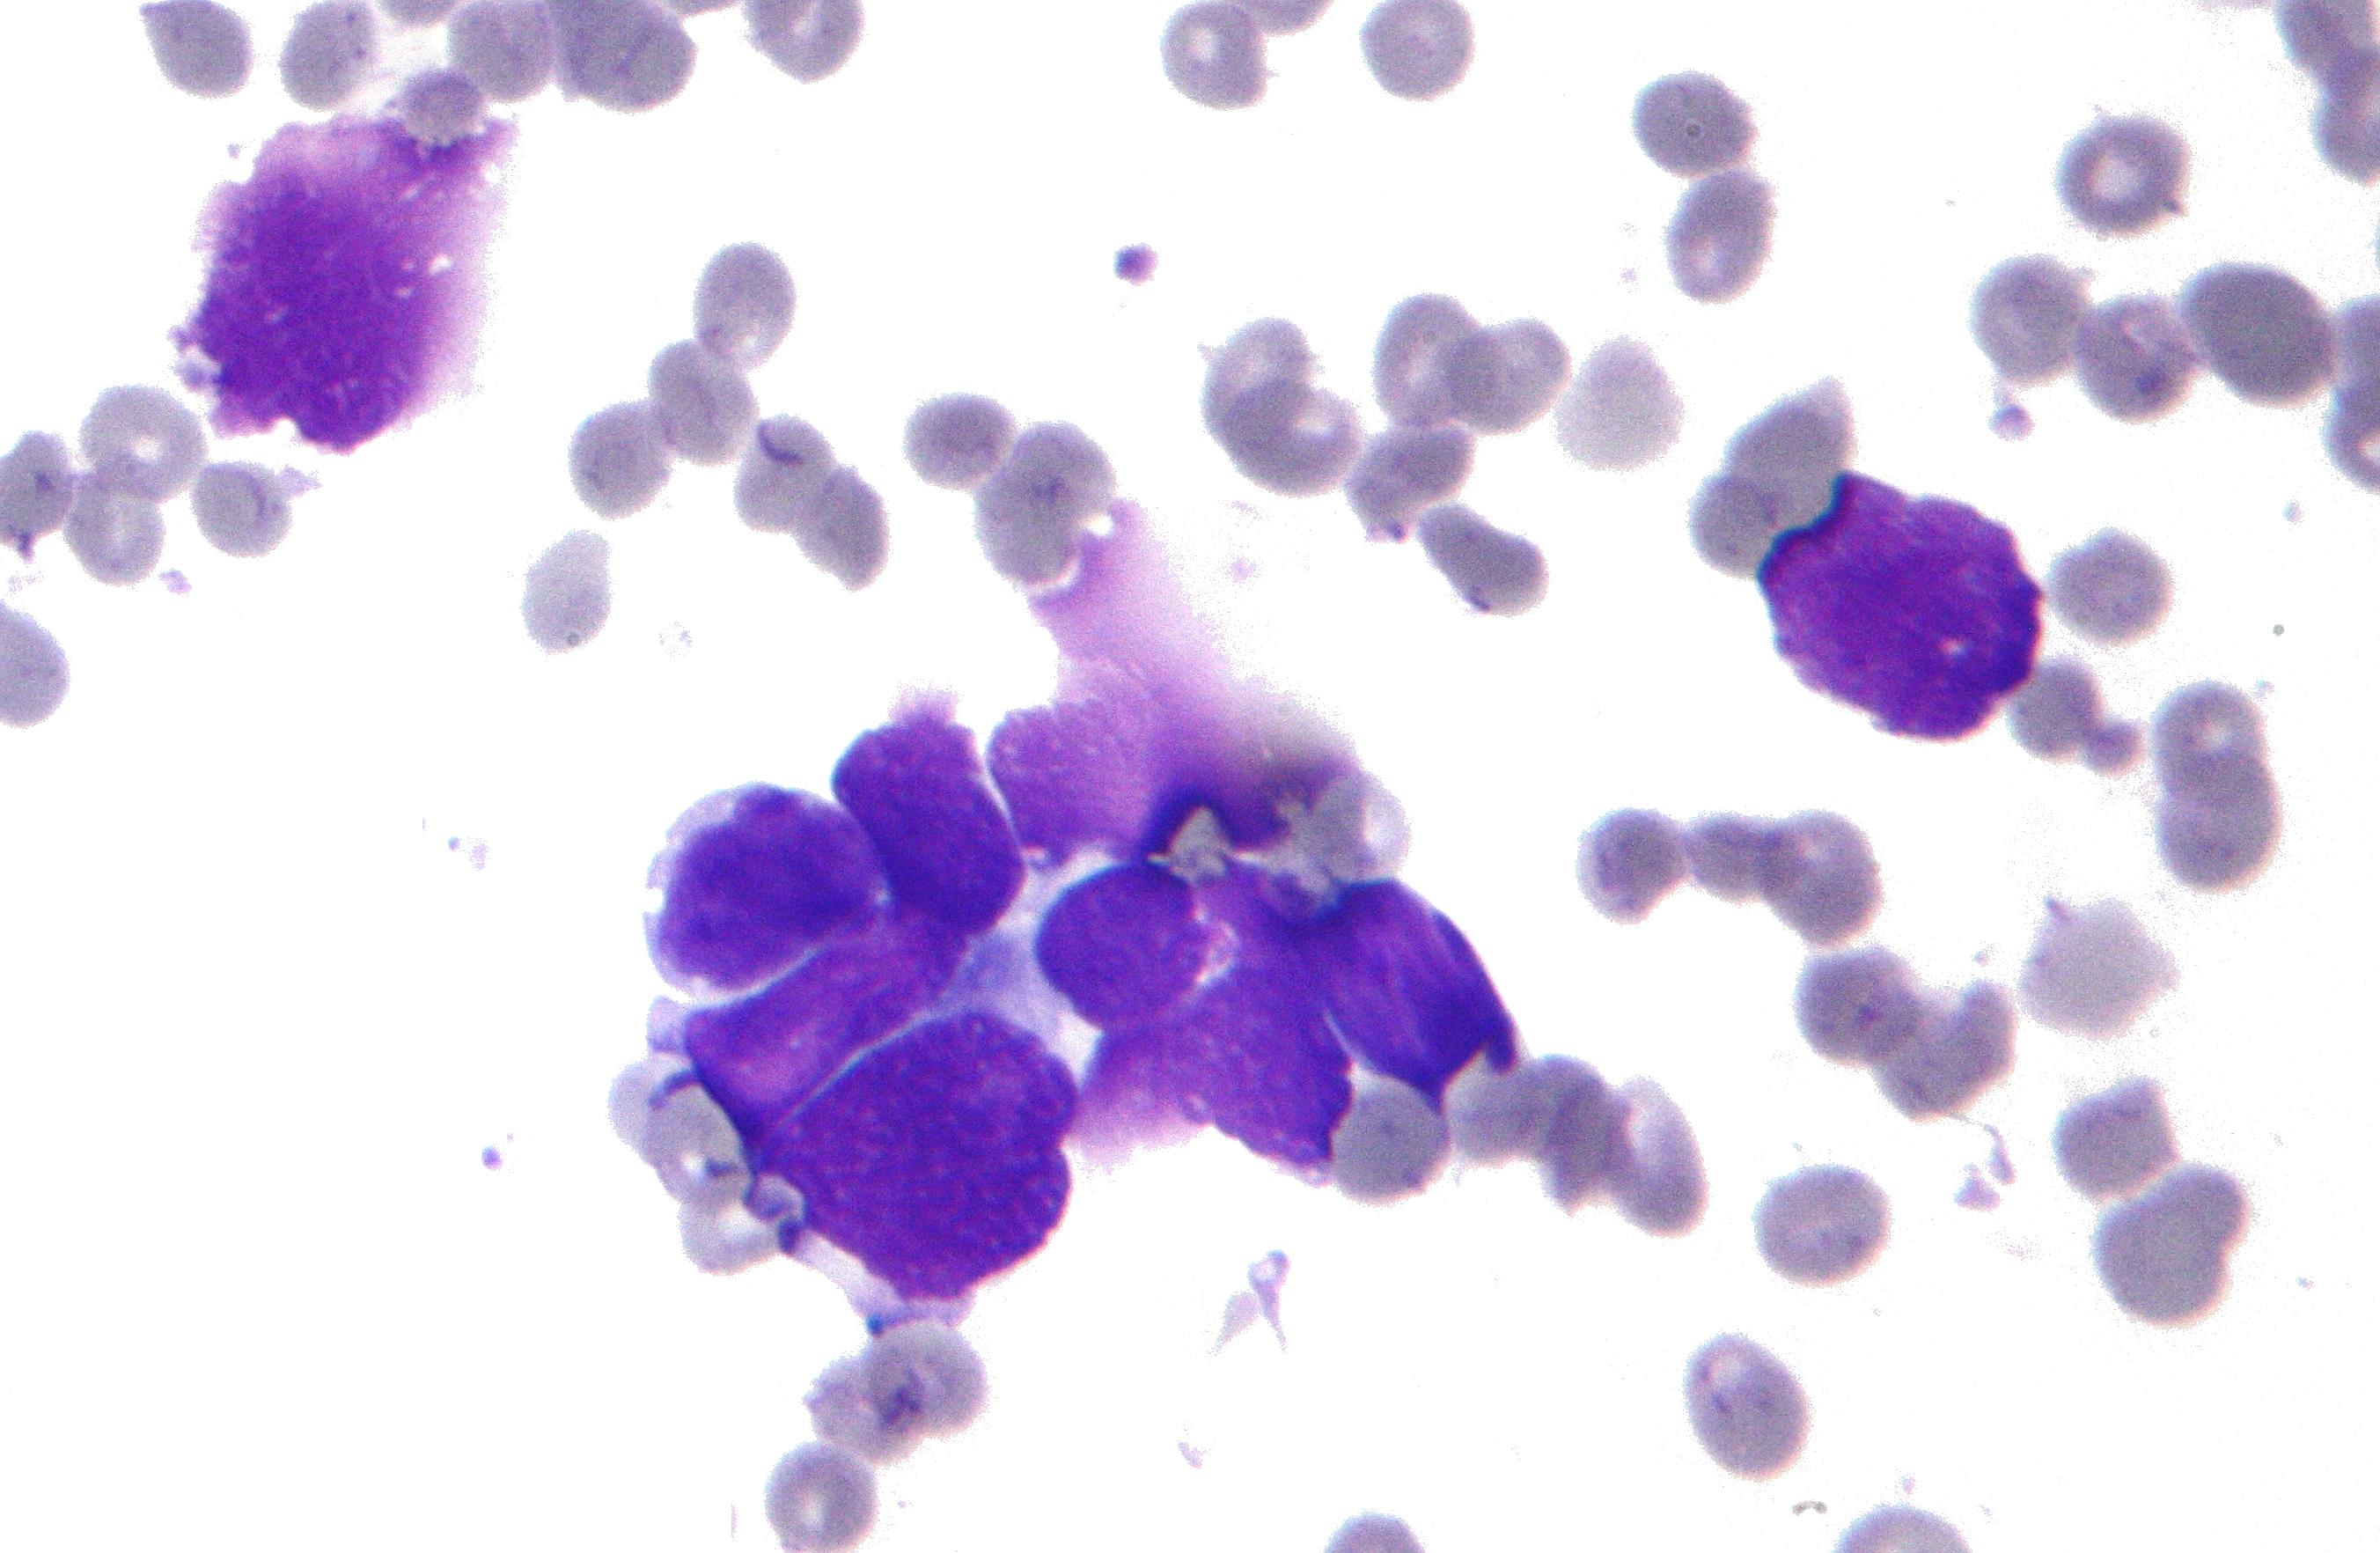 cancer neuroendocrine a petite cellule